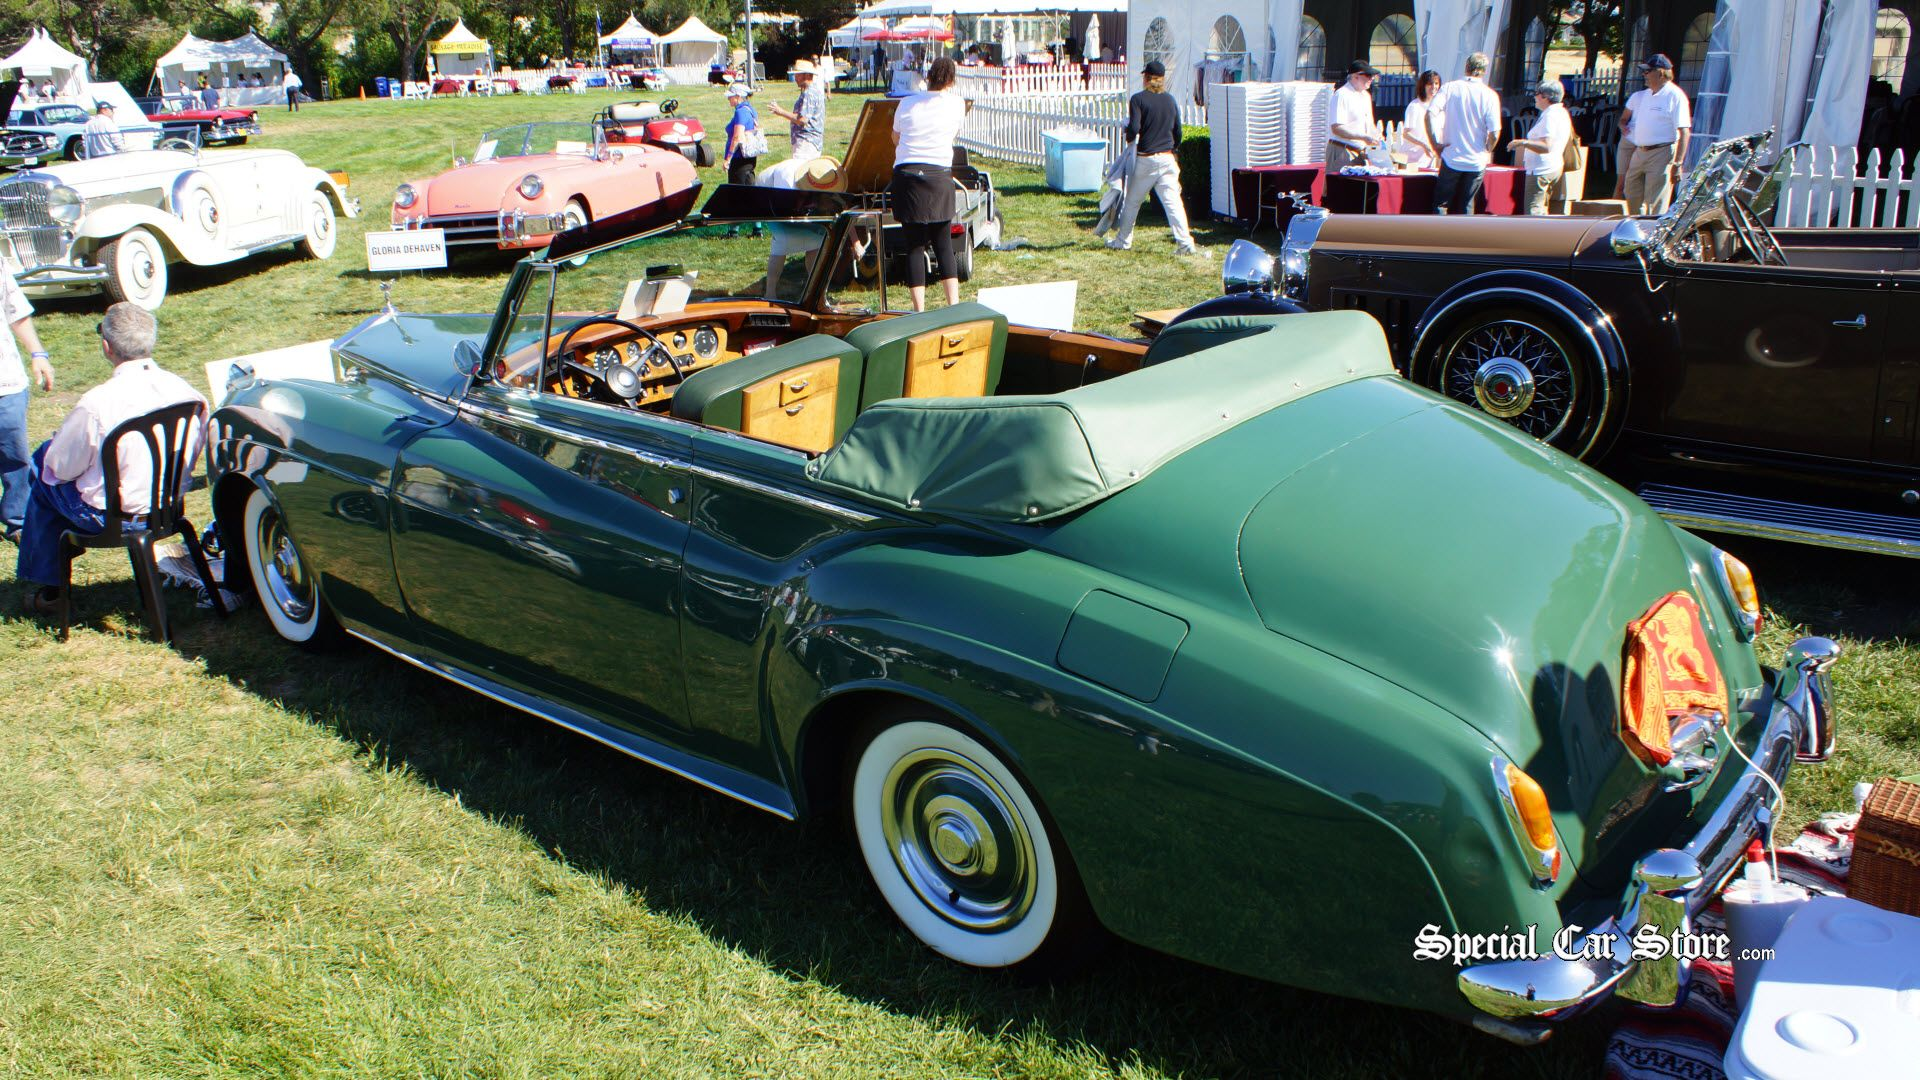 1960 Rolls Royce Silver Cloud 2 Owned By Elizabeth Taylor Marin